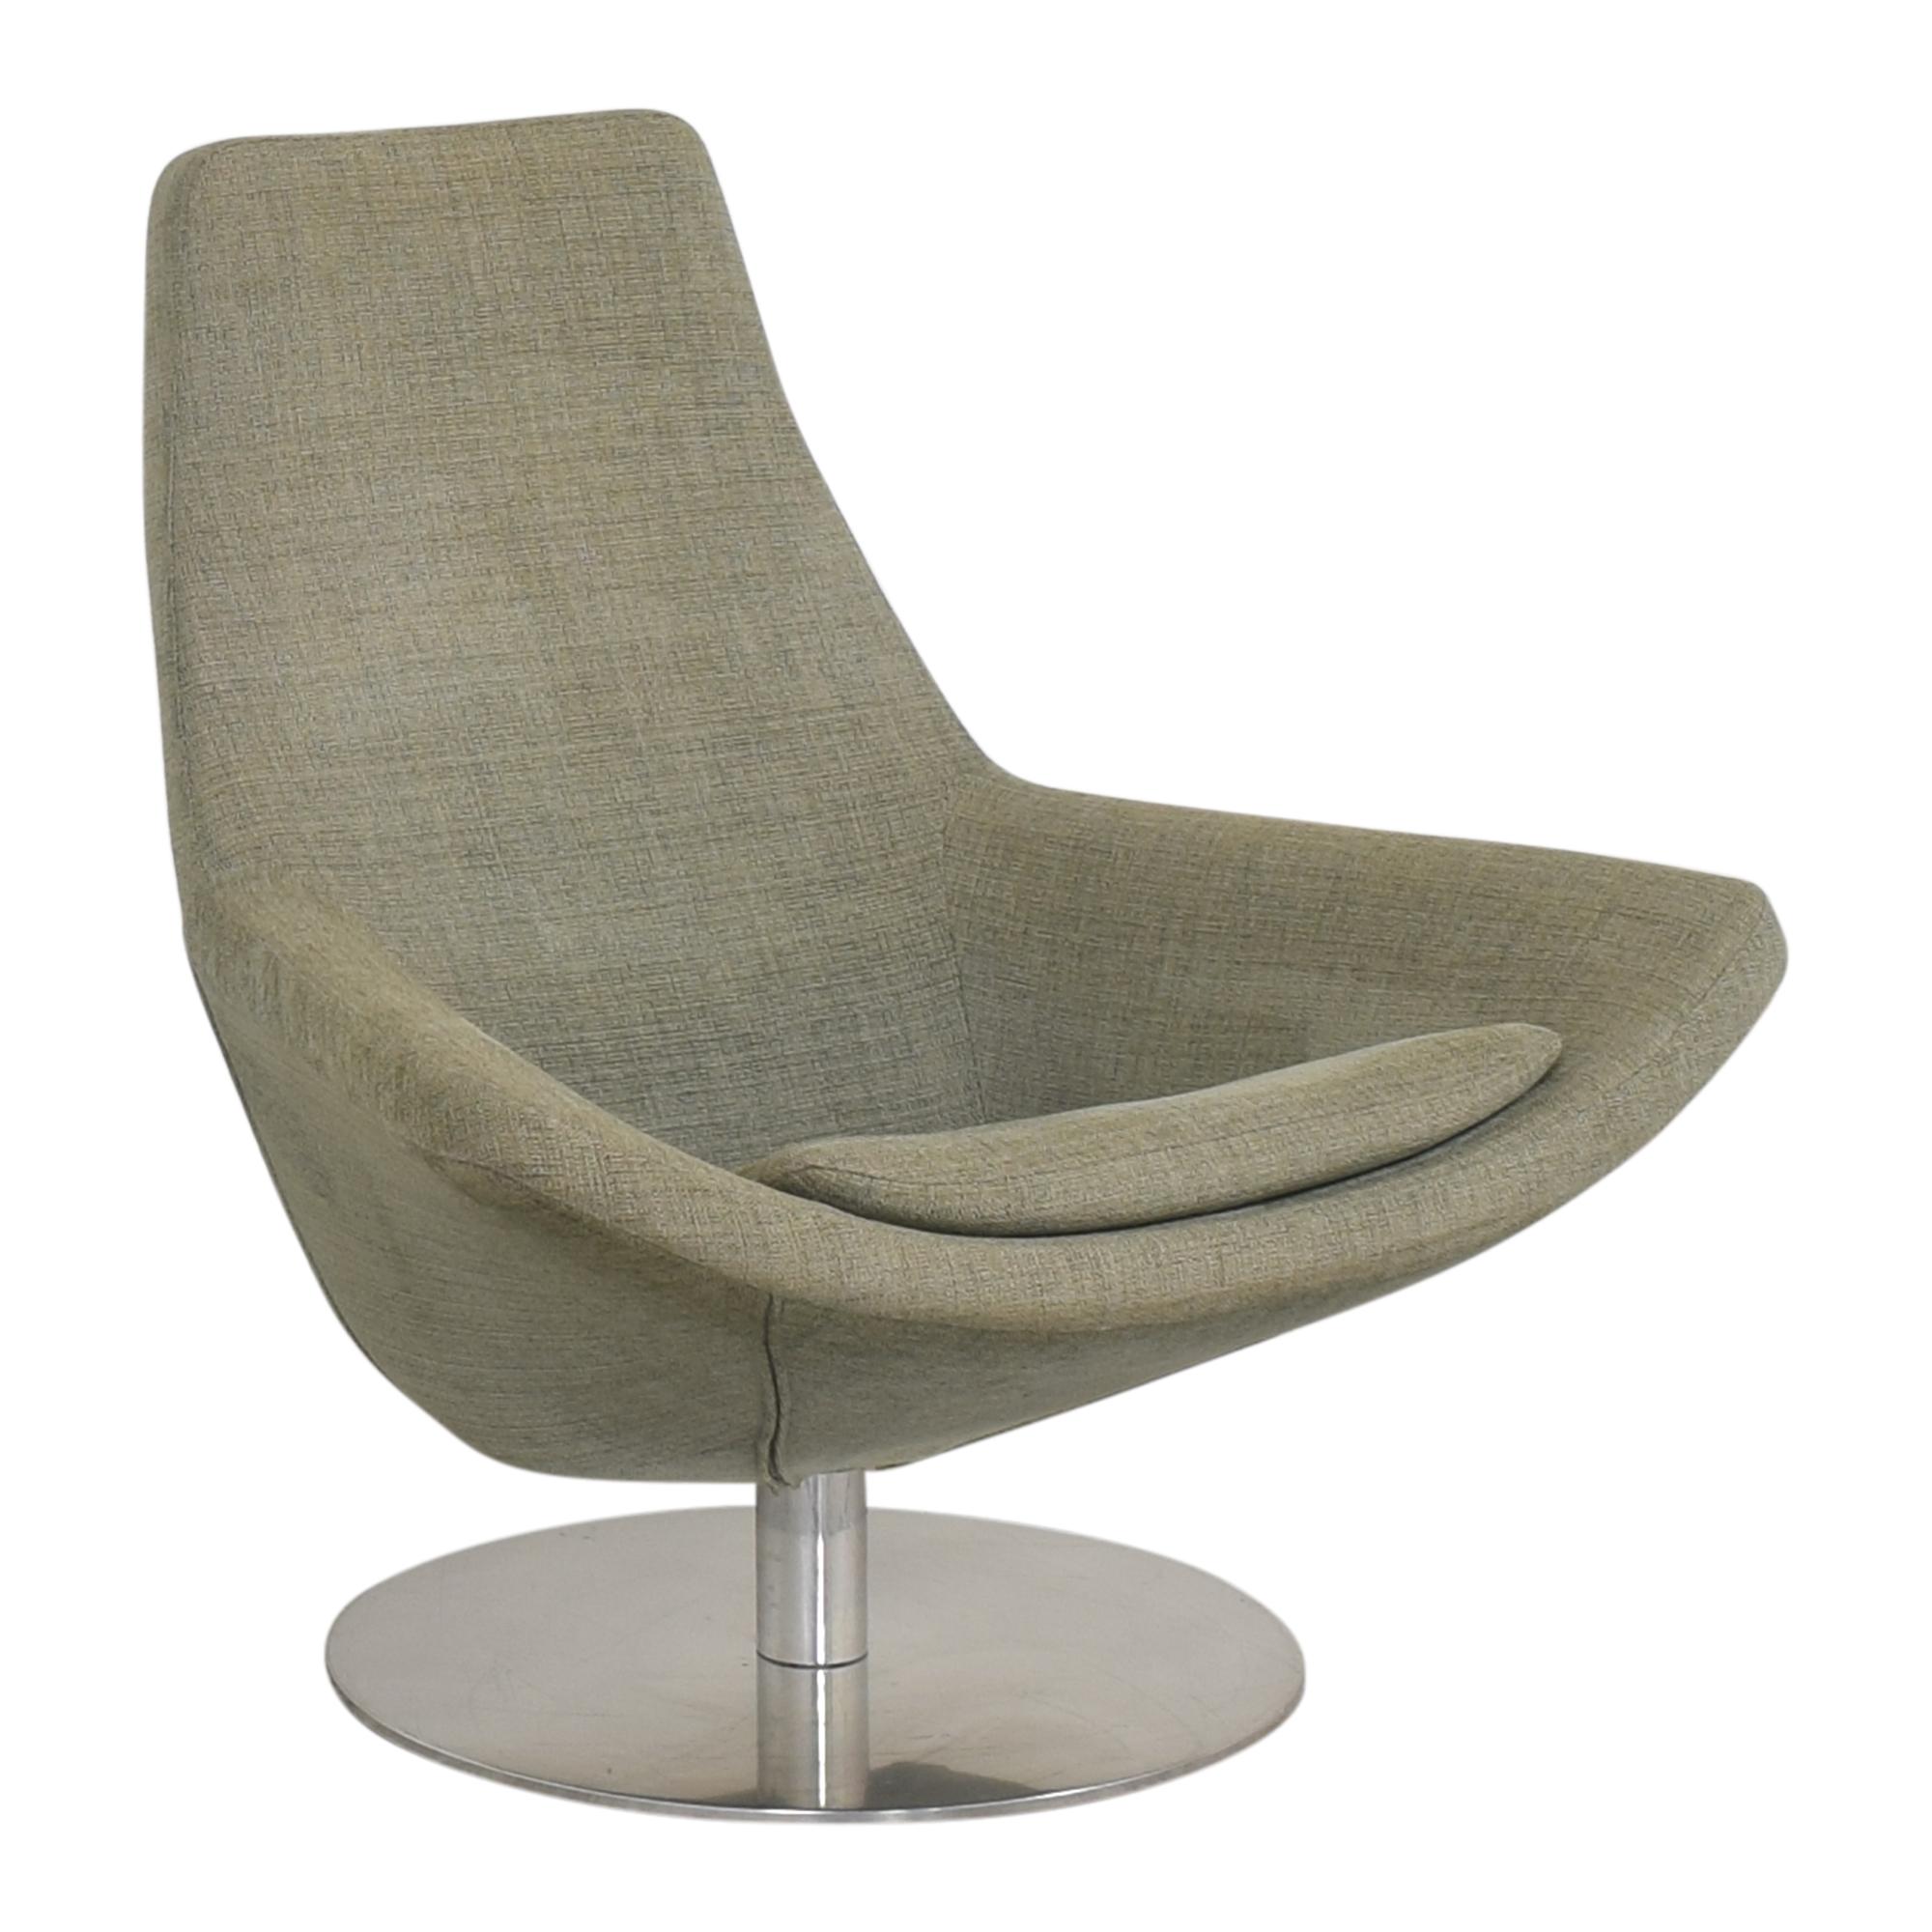 shop B&B Italia Metropolitan Swivel Chair B&B Italia Accent Chairs